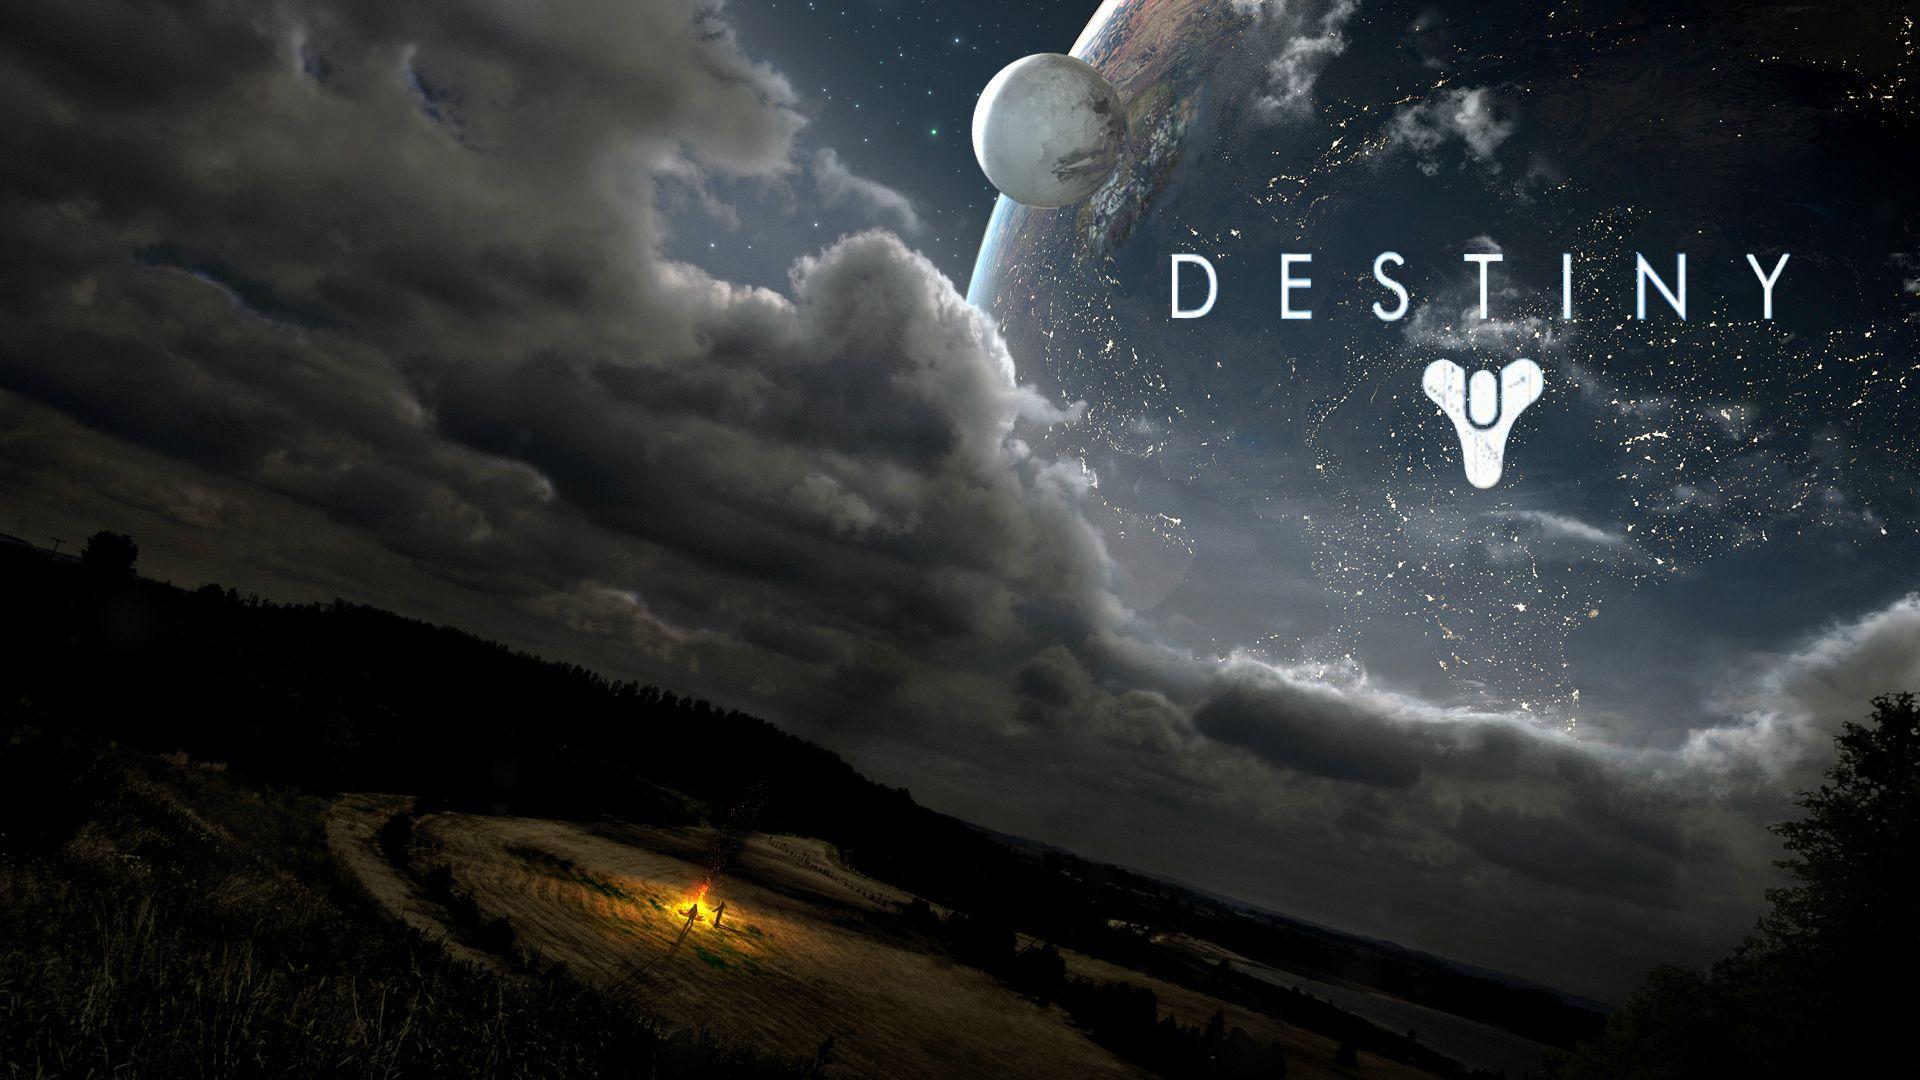 Destiny 2 Ultra HD